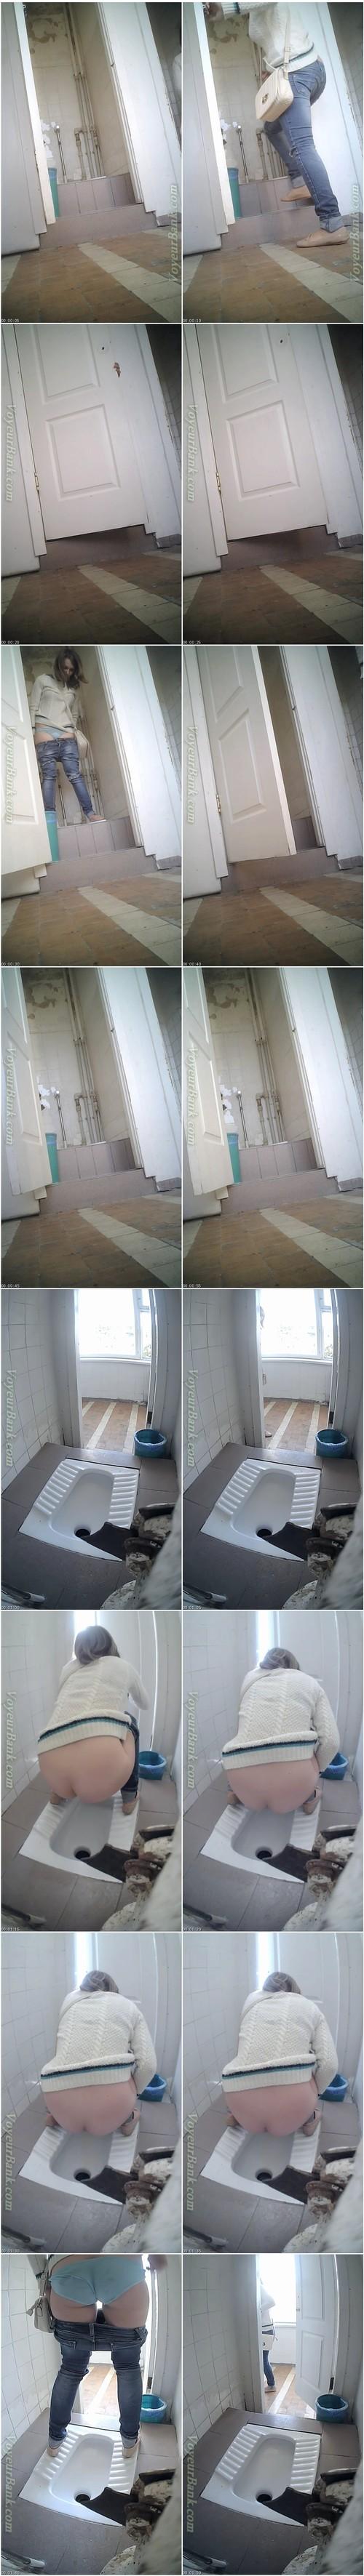 http://ist5-1.filesor.com/pimpandhost.com/9/6/8/3/96838/6/j/p/J/6jpJG/VoyeurBank0816_thumb_m.jpg